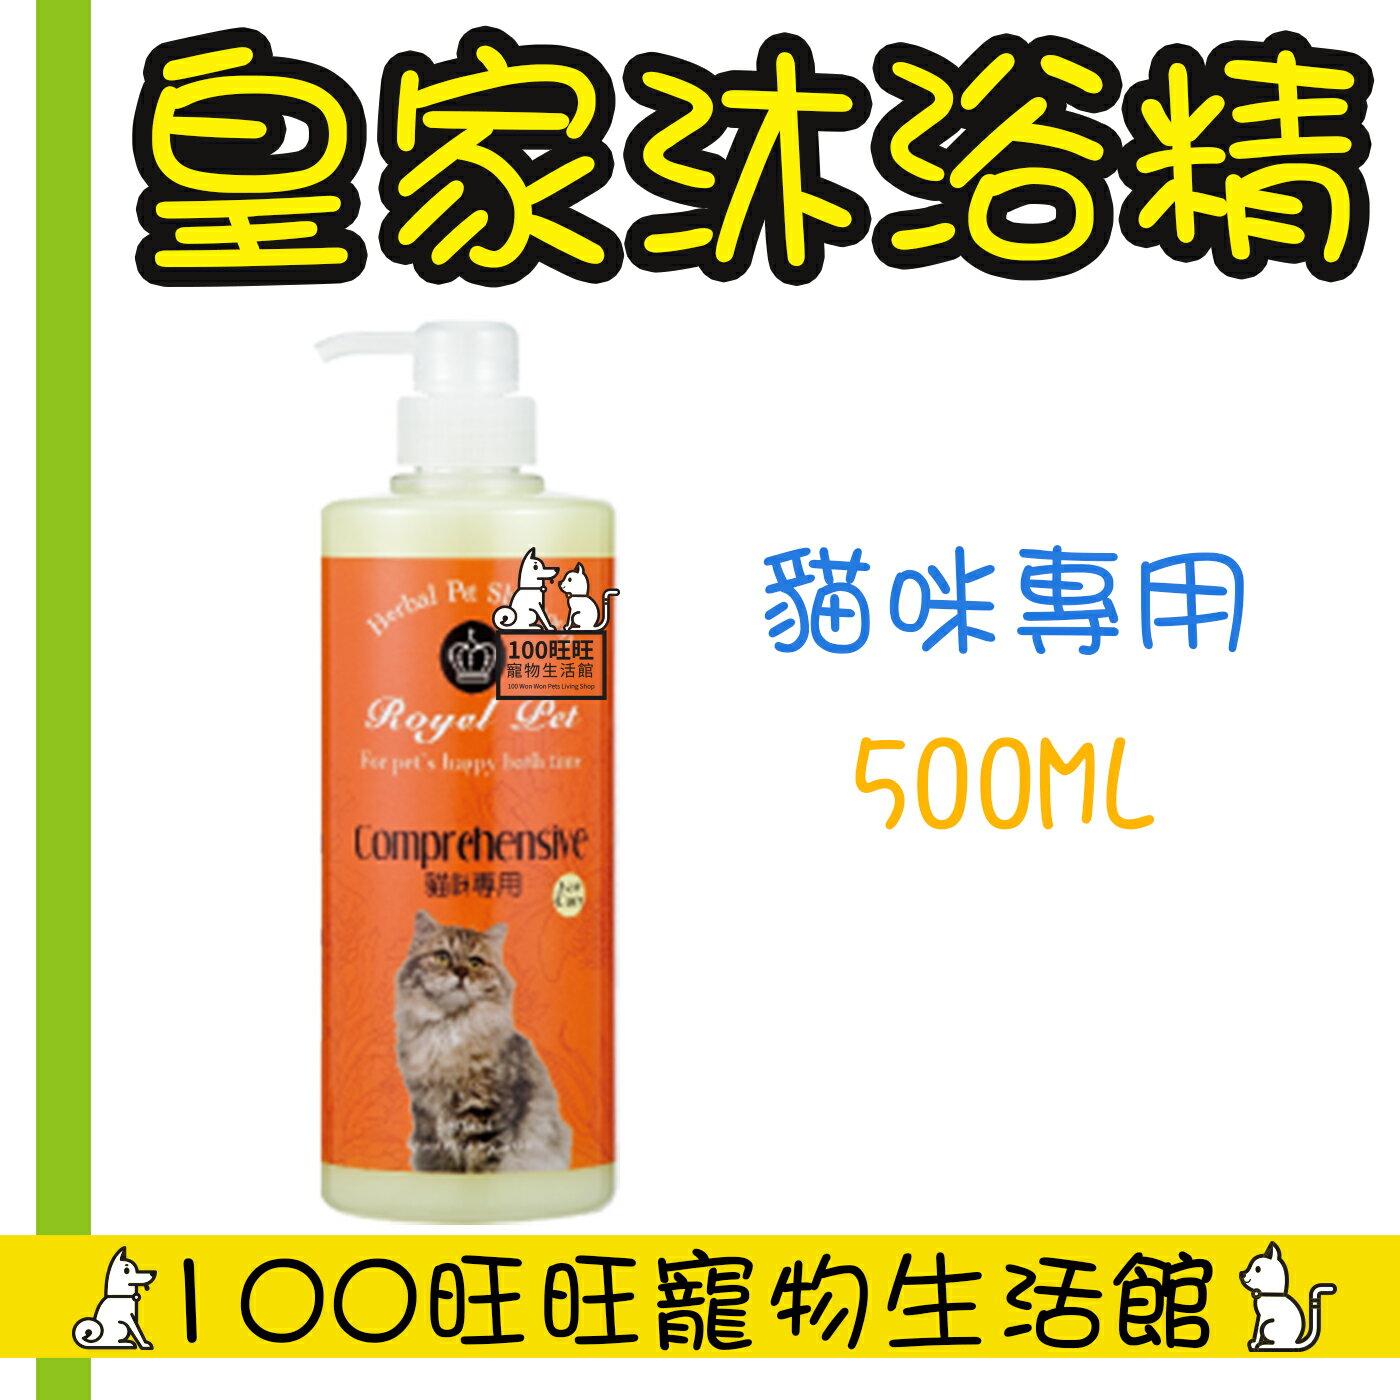 Royal Pet皇家系列 皇家沐浴精 貓咪專用 500ml 貓咪專用洗毛精